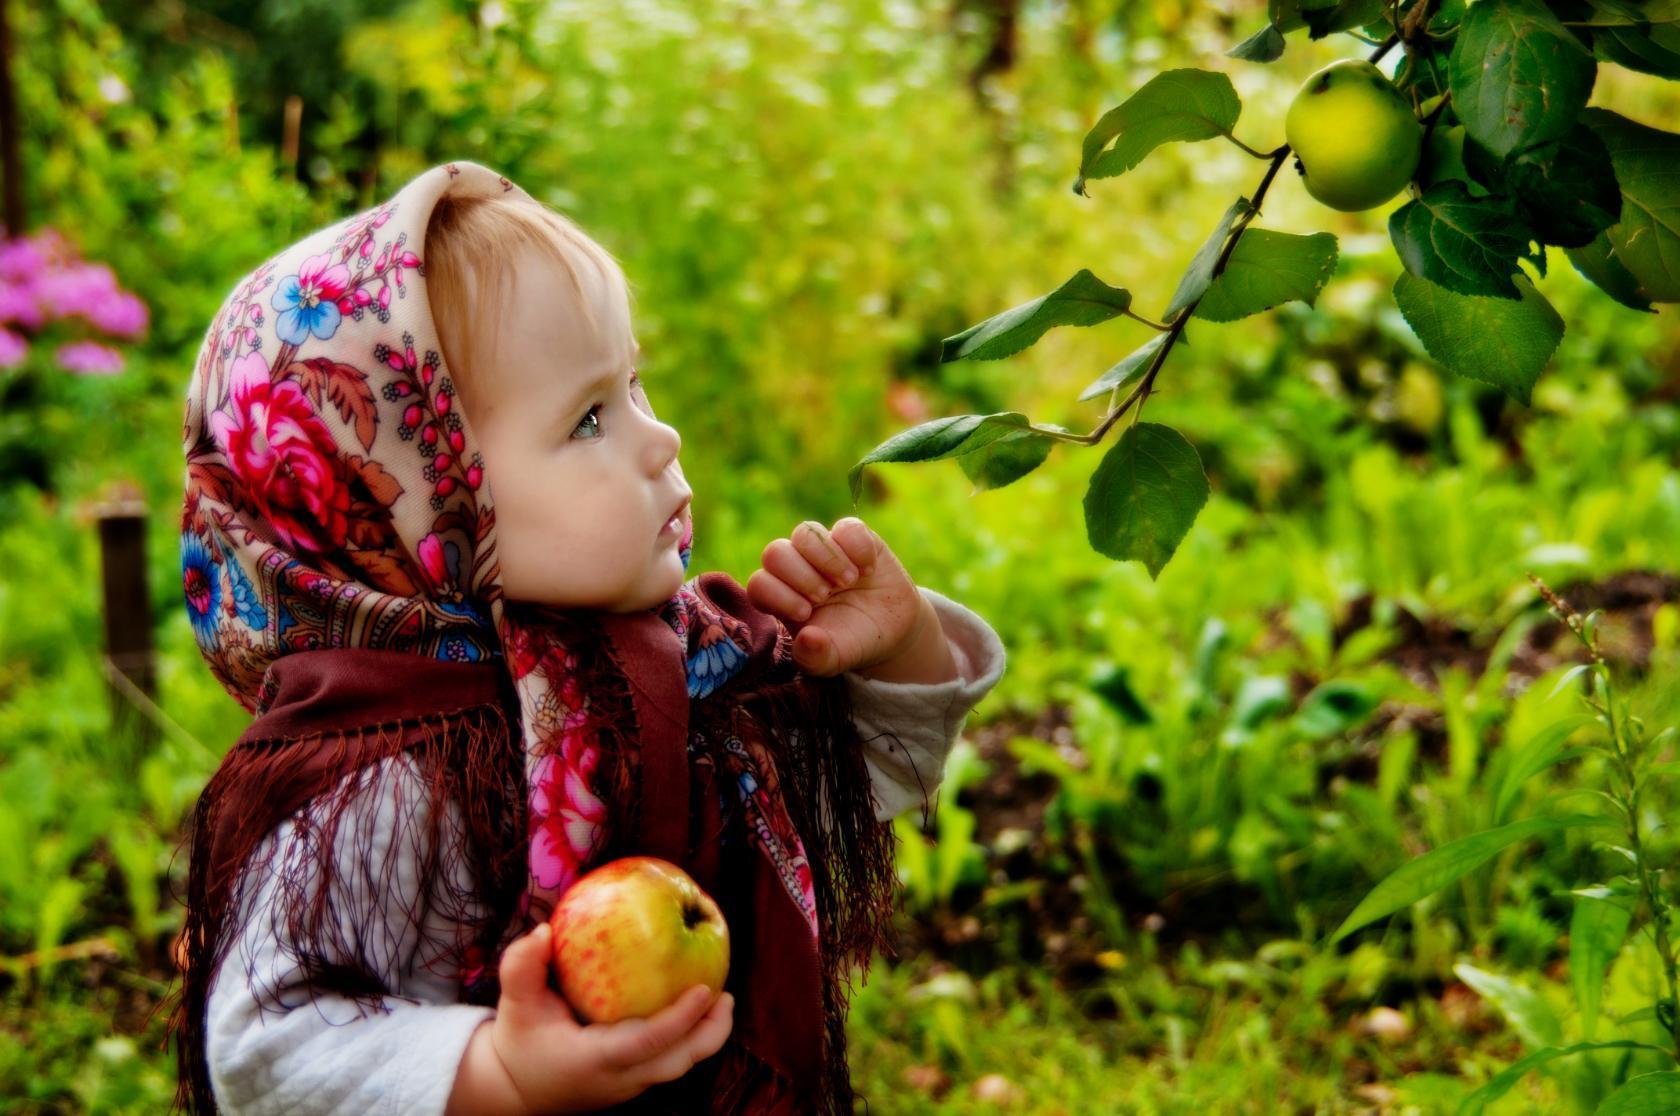 Яблочки). Дачники и дачницы